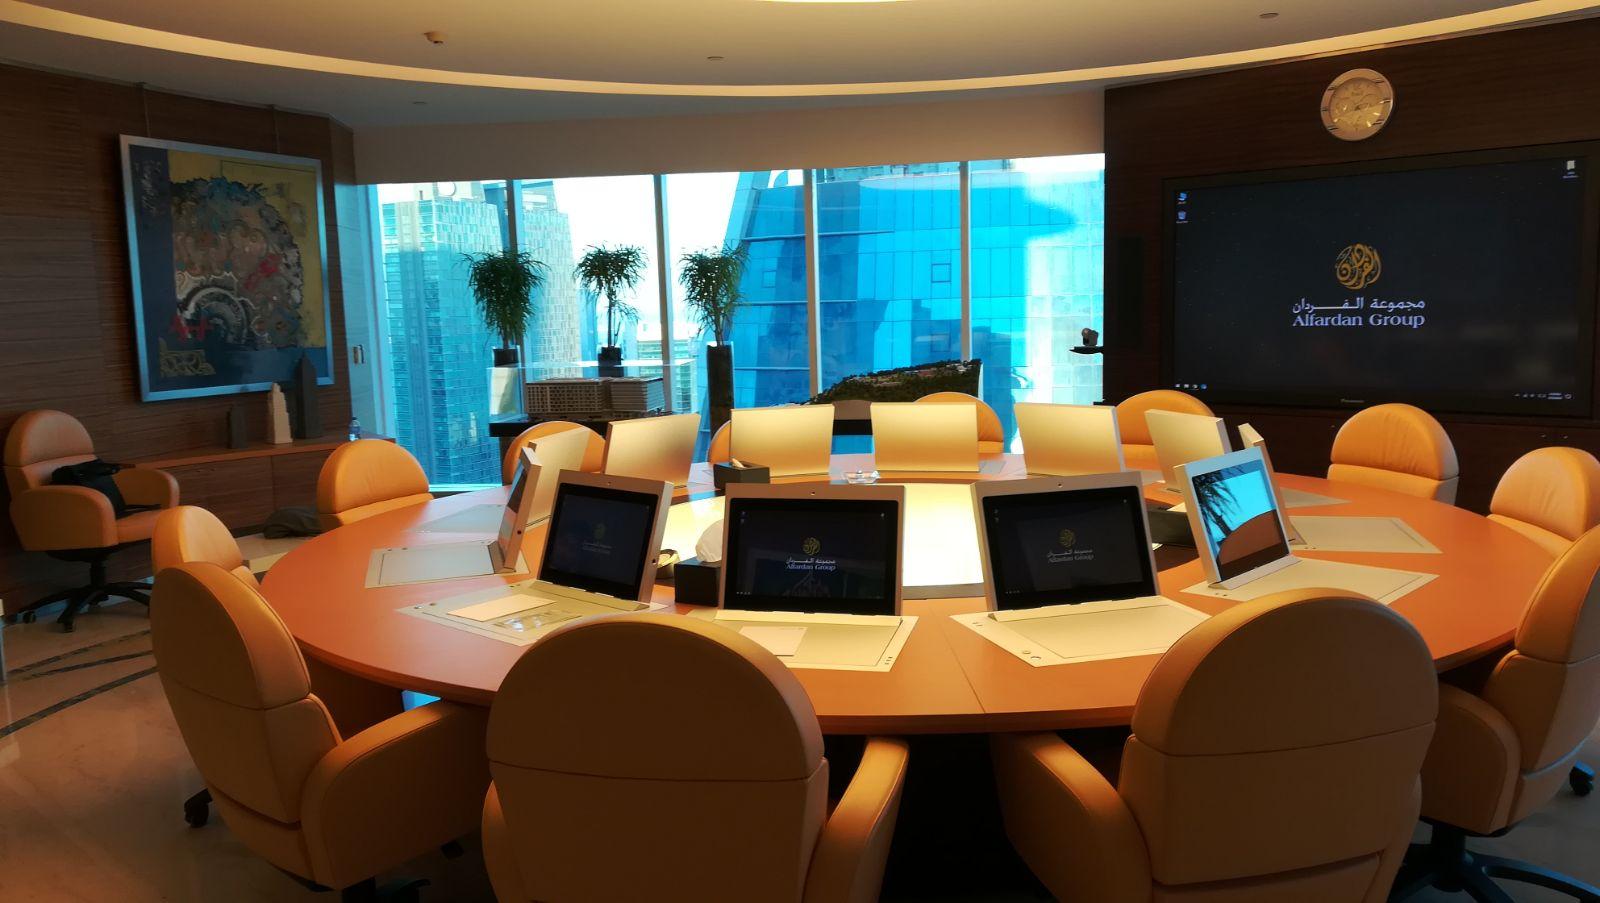 La siège du groupe Alfardan à Doha, au Qatar